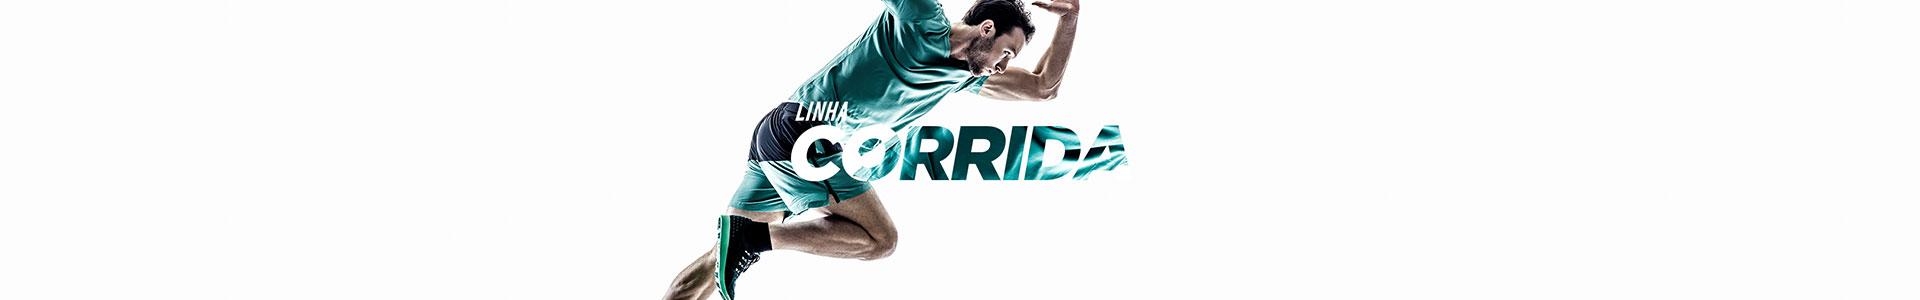 Banner Corrida Interno